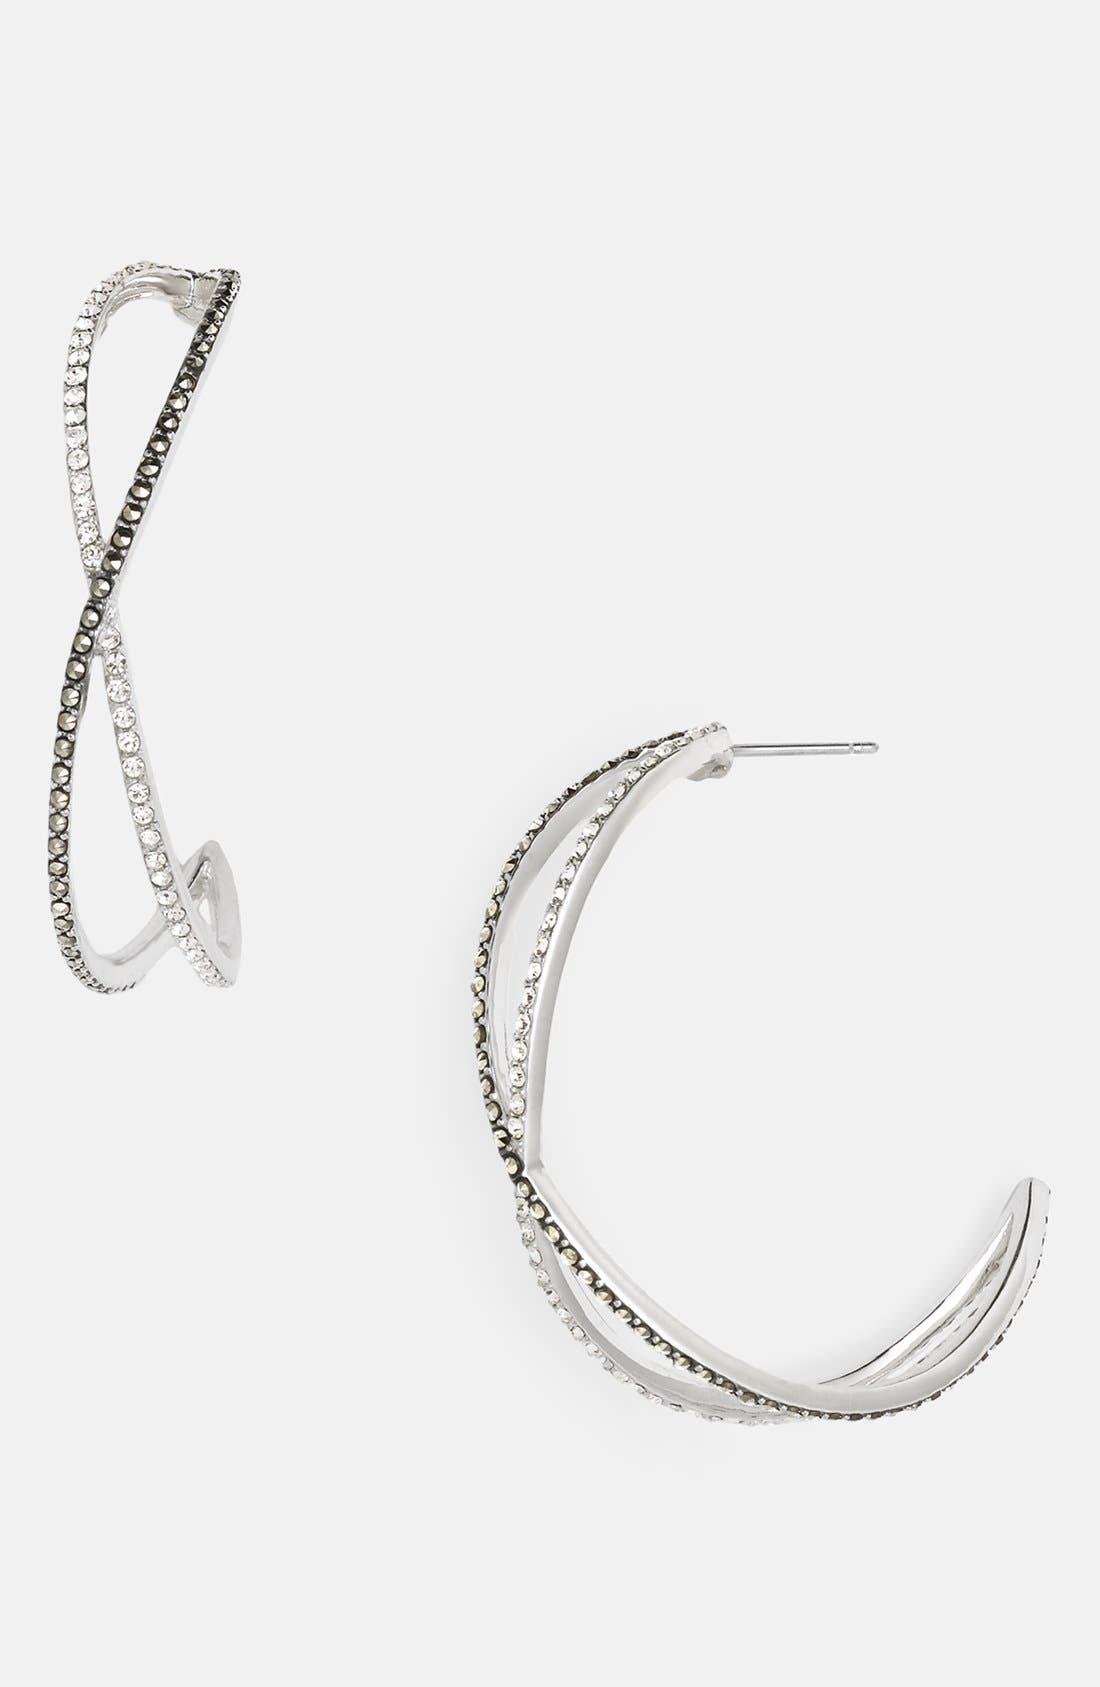 Main Image - Judith Jack 'Licorice' Large Hoop Earrings